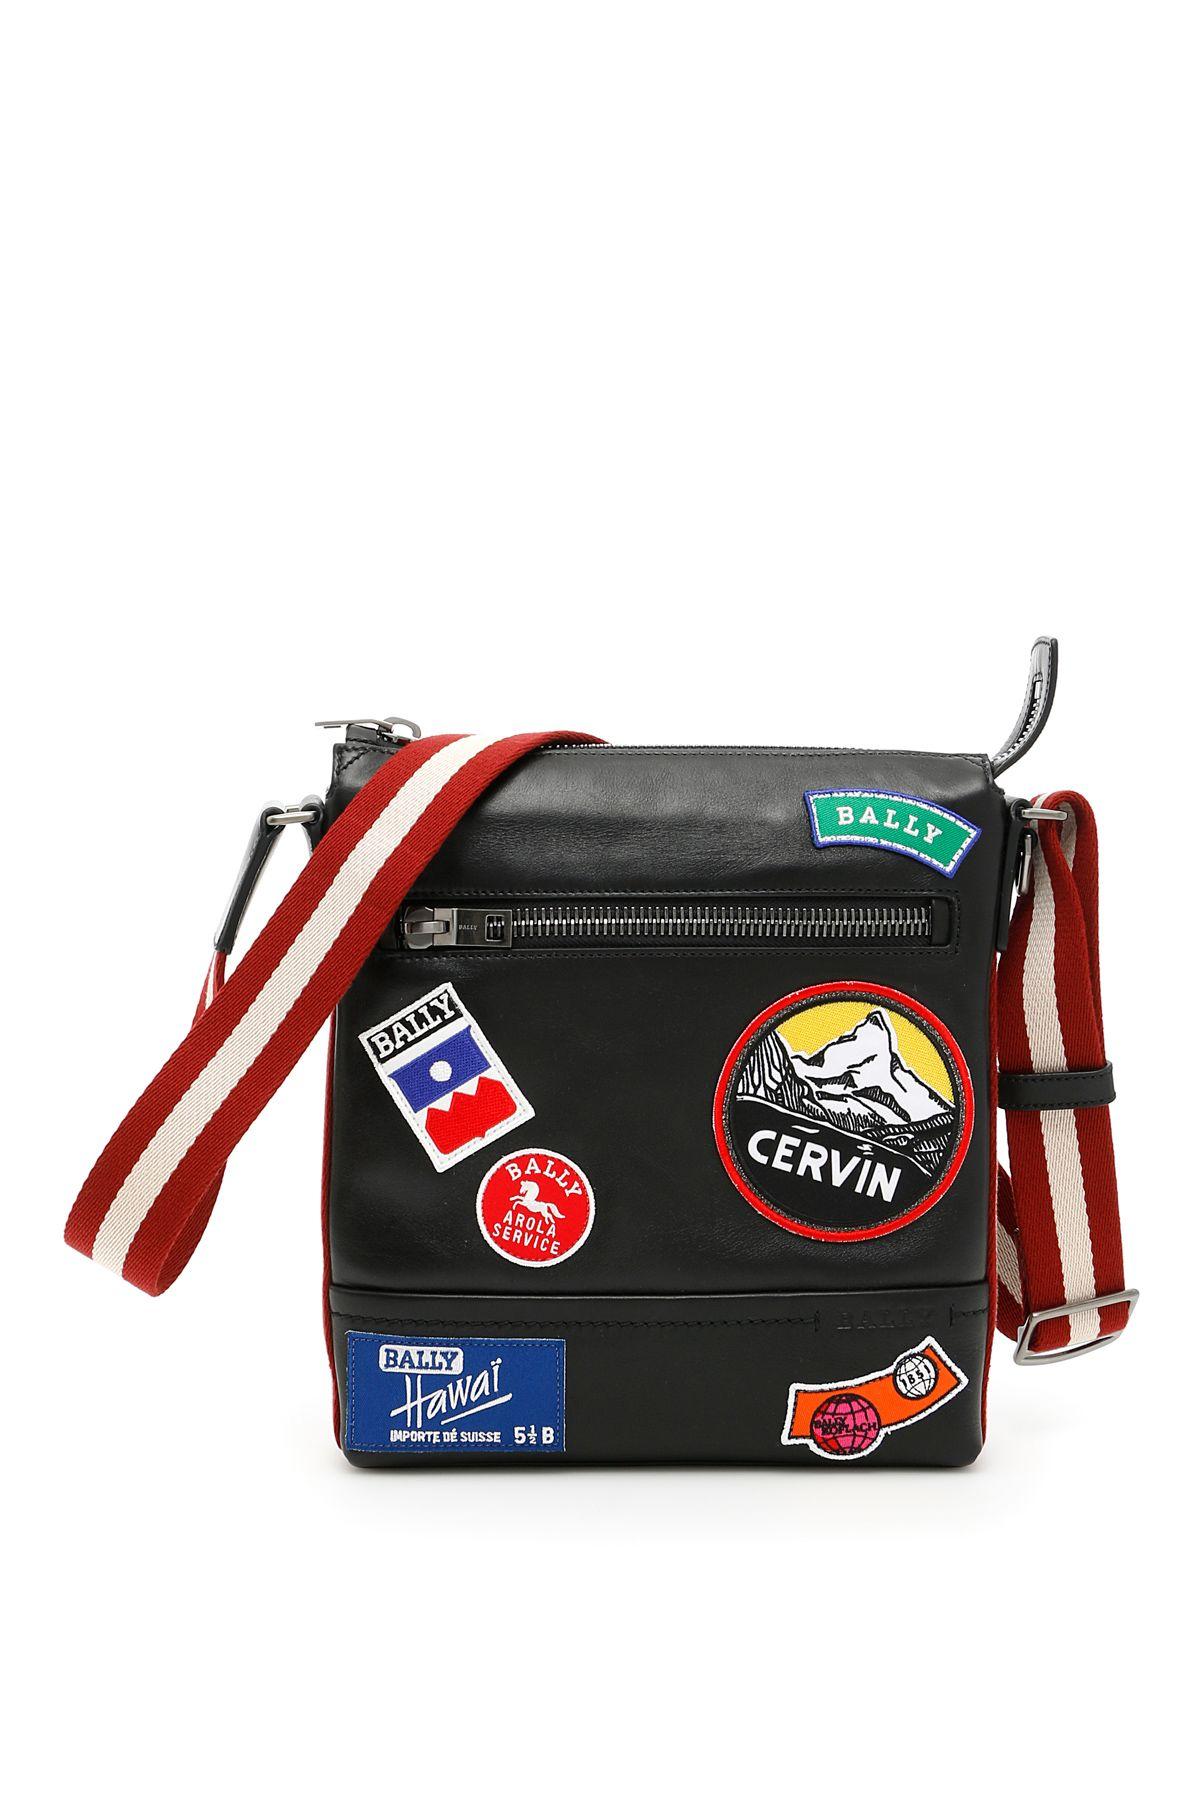 Trezzini Bag